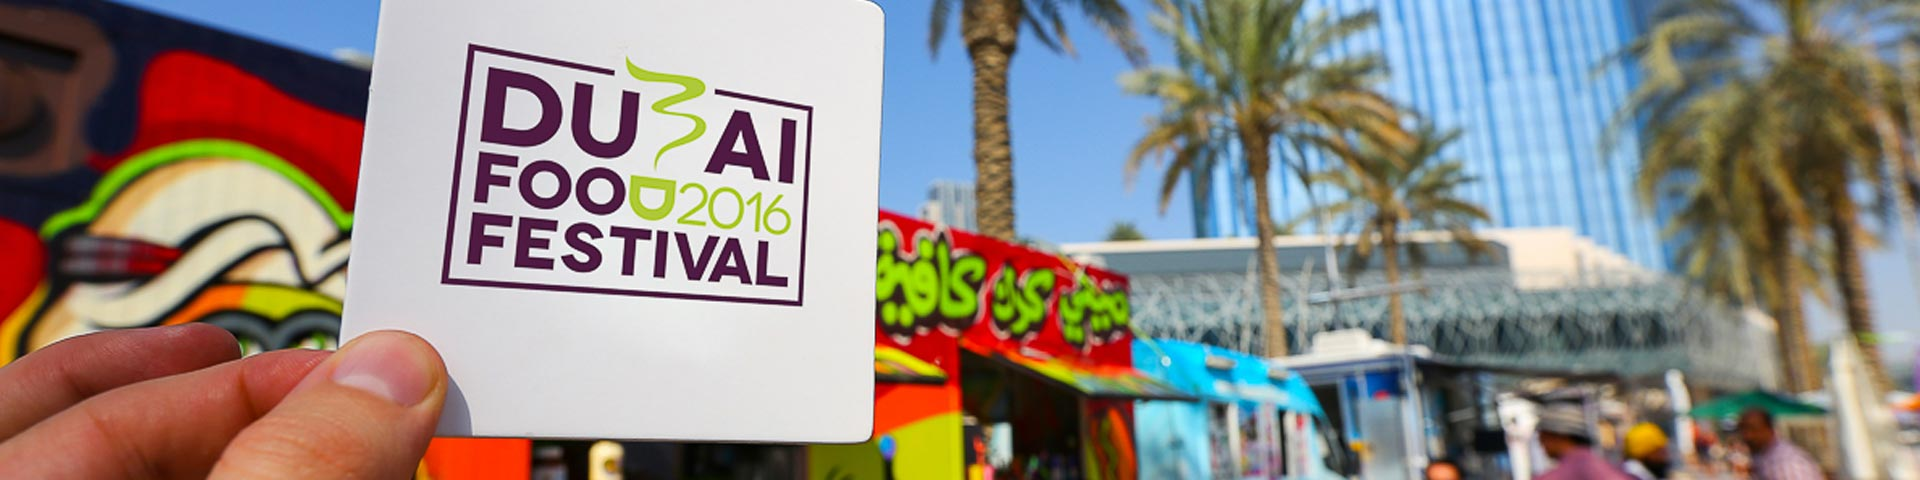 Dubai Food Festival 2016 – 25 Febbraio – 9 Marzo